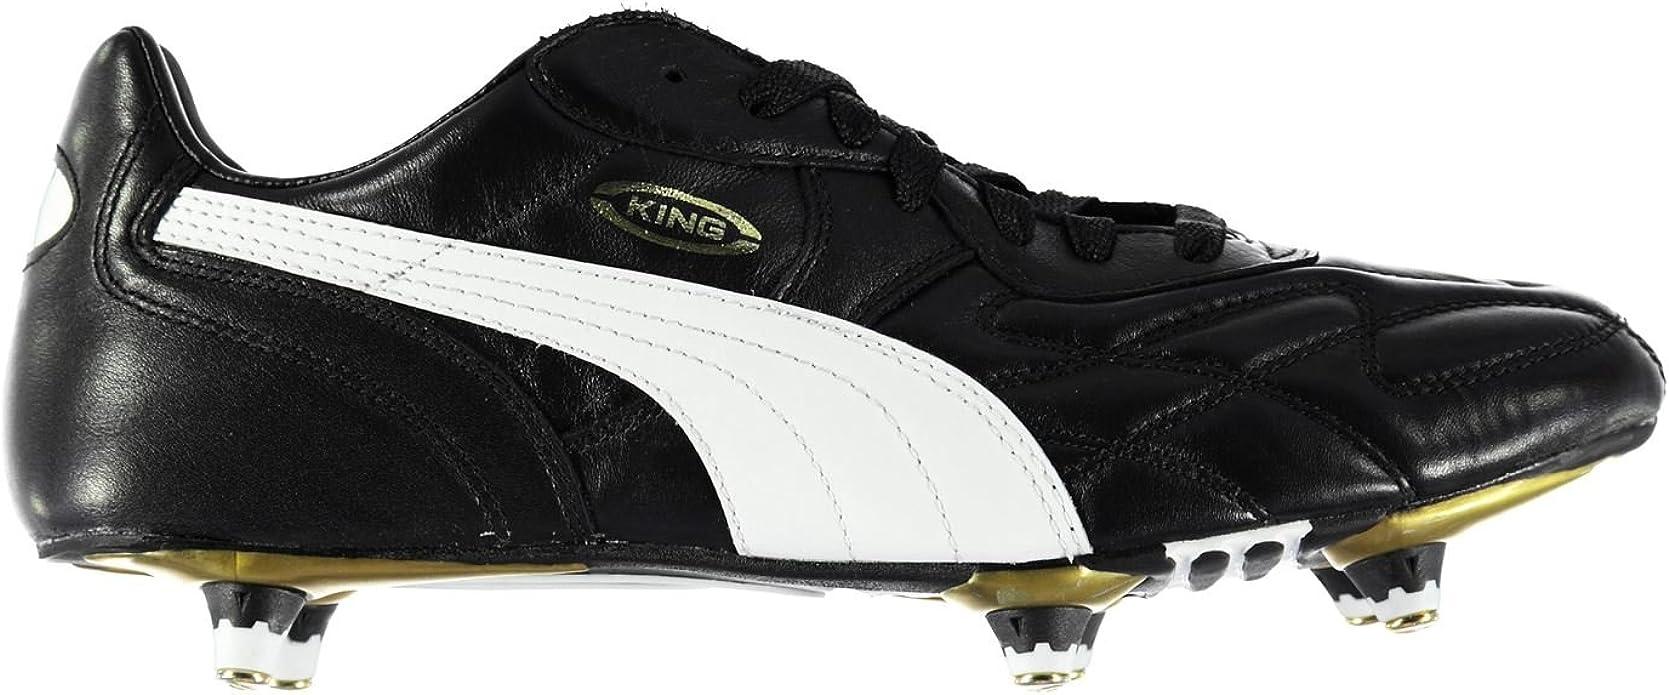 PUMA Mens King Pro SG Mens Football Boots